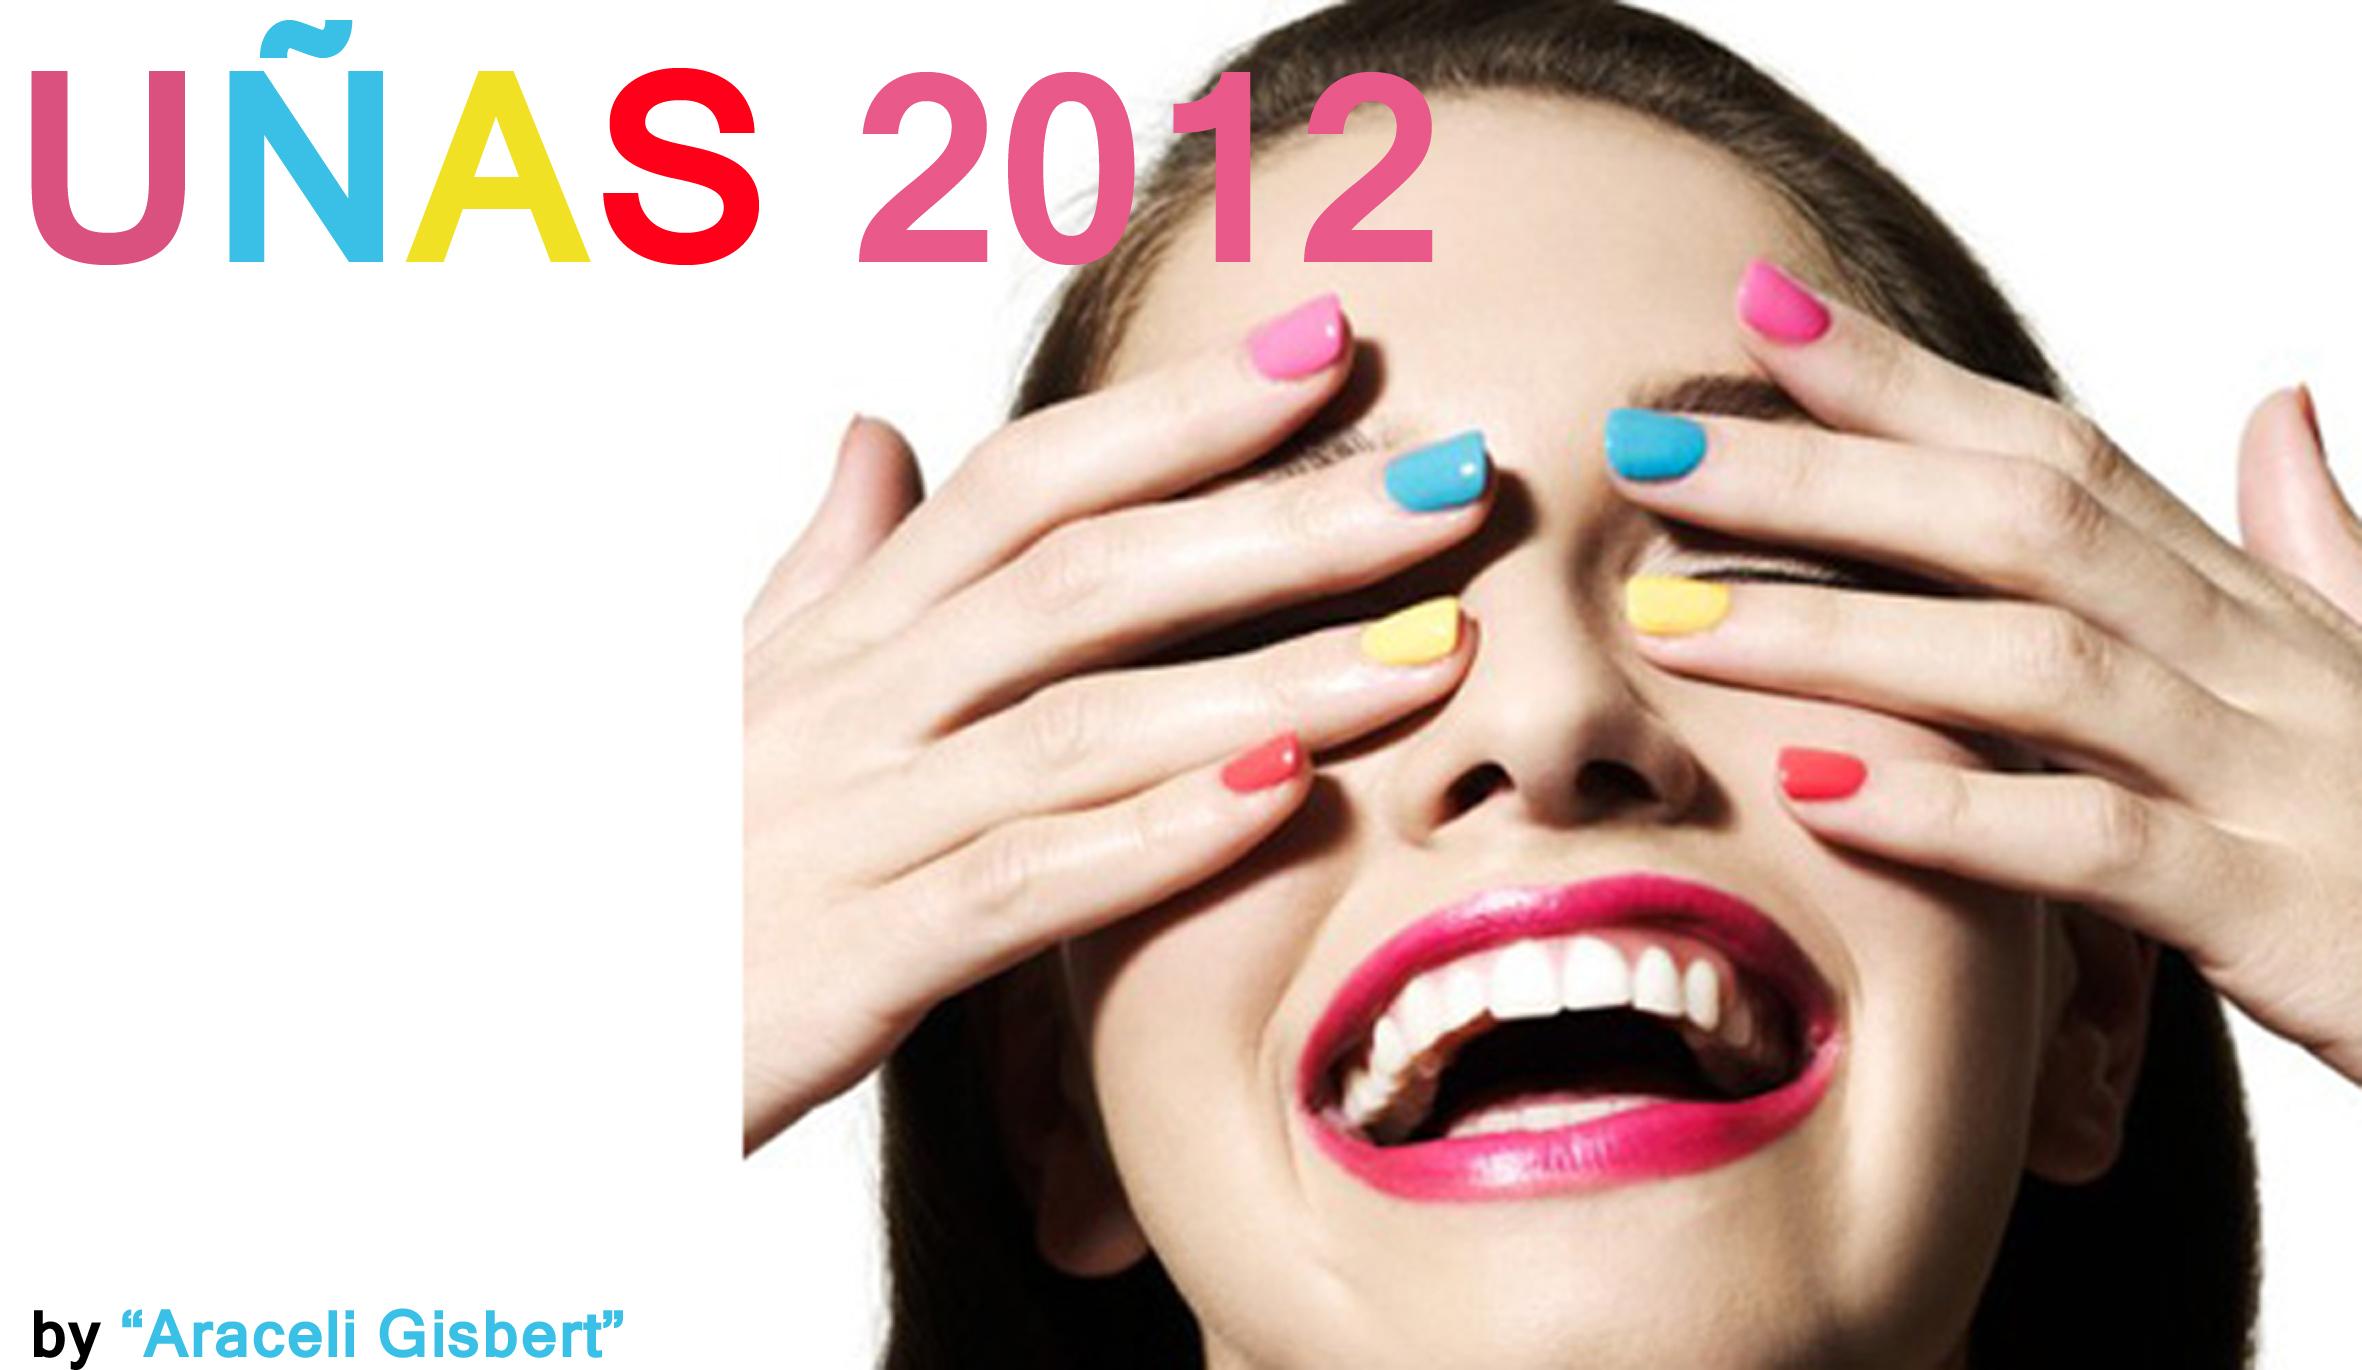 uñas color multicolor araceli gisbert tendencias diseño moda social media posicionamiento web